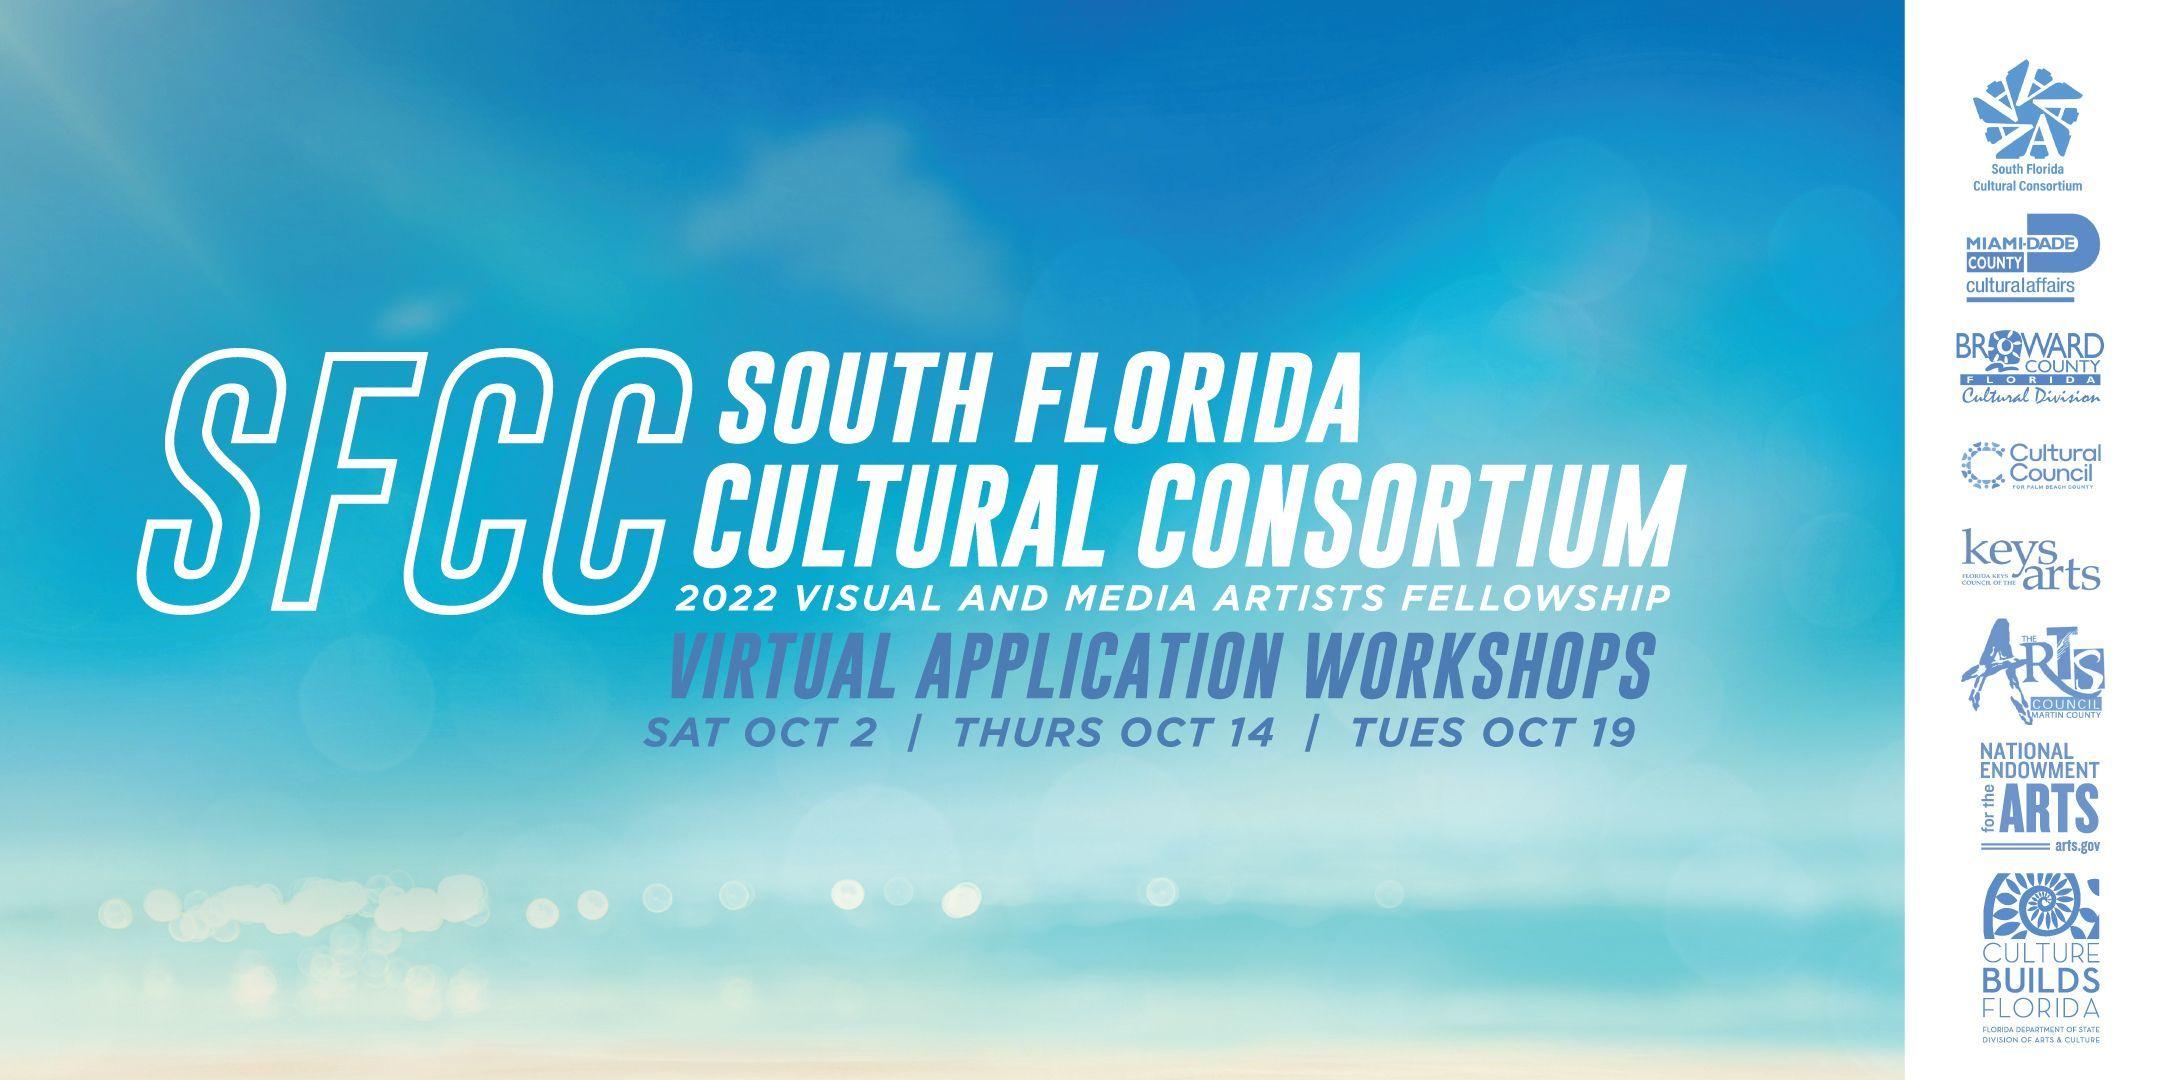 Workshop information for South Florida Cultural Consortium